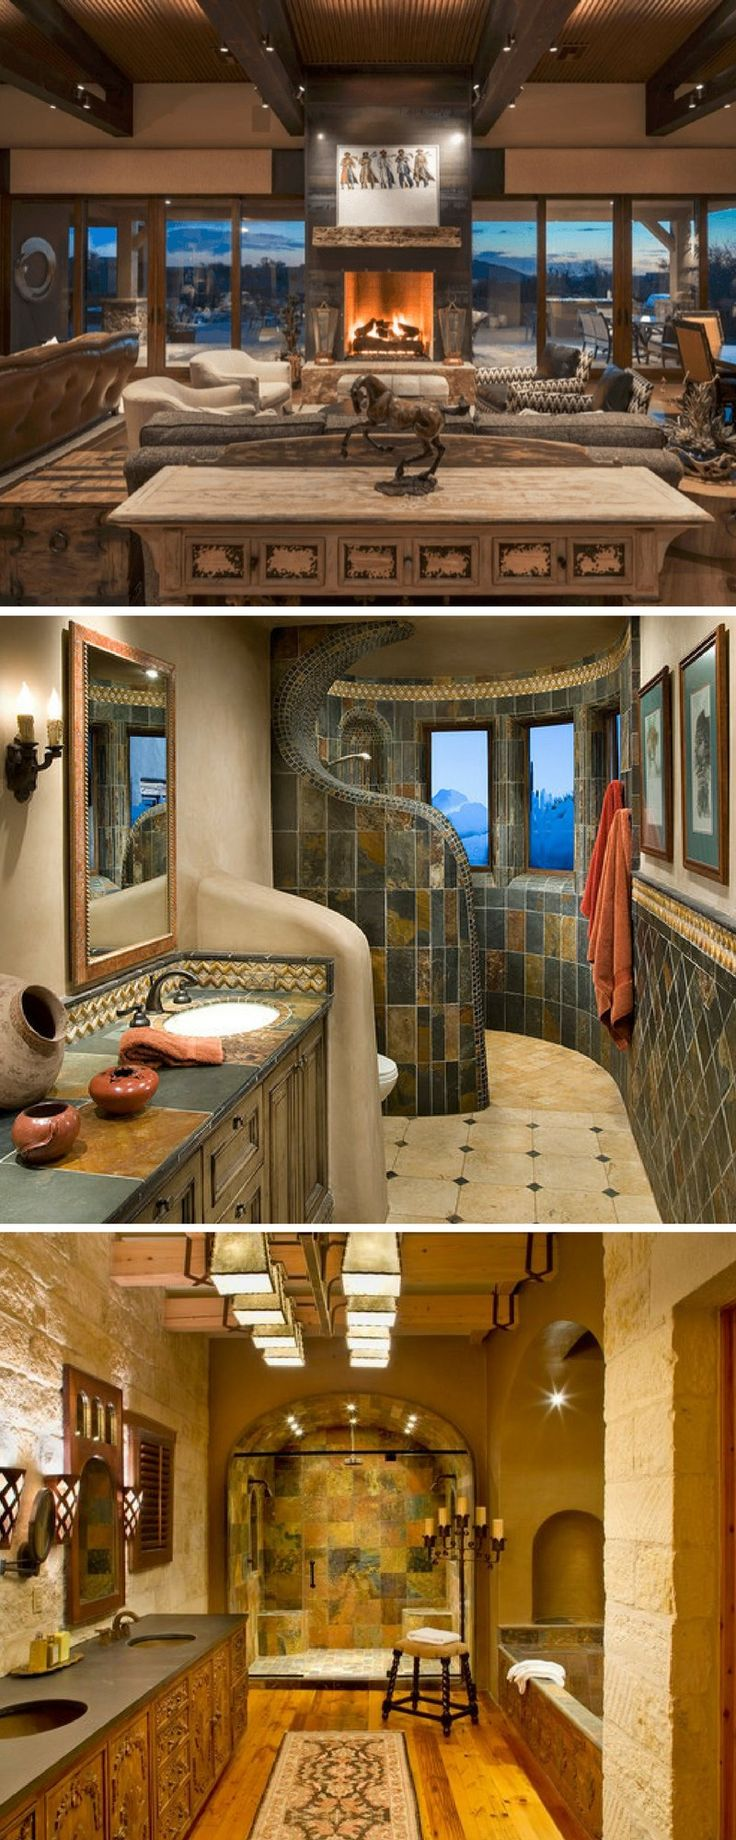 Southwest decor living room   best Ideas for the House images on Pinterest  Interior